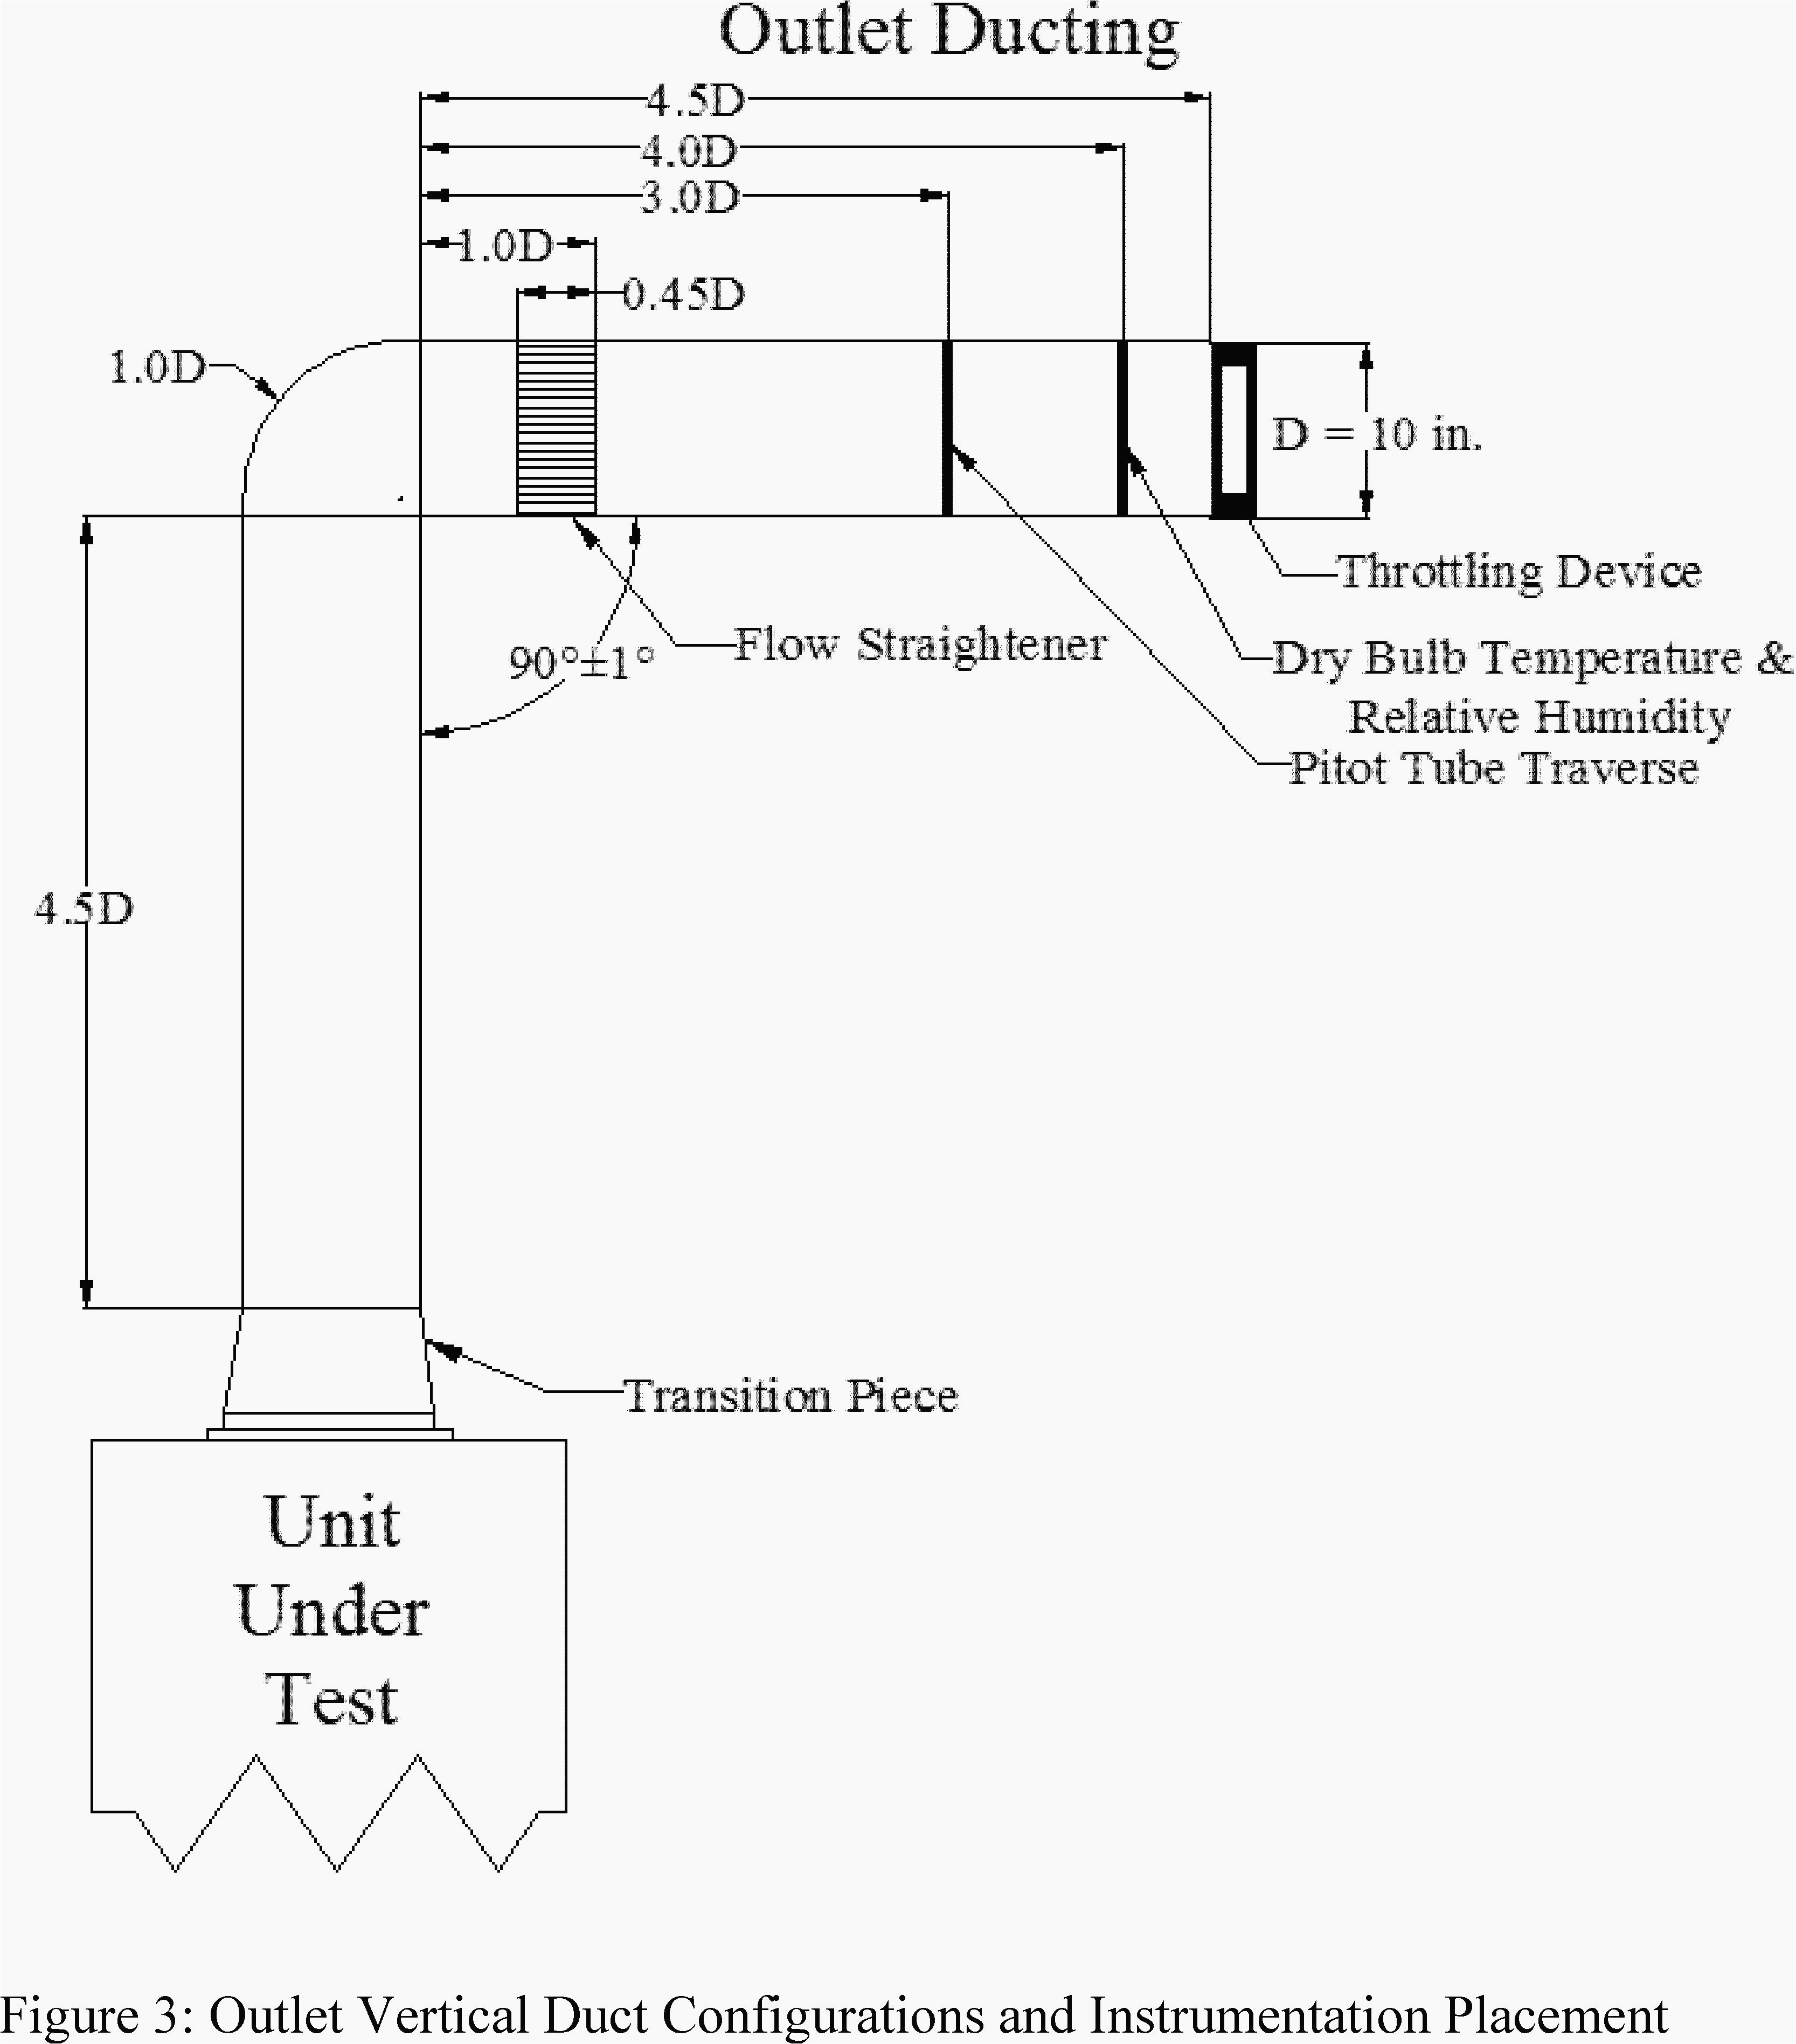 Home Outlet Wiring Diagram Wiring Diagram De Walt Dw306 Wiring Diagram Review